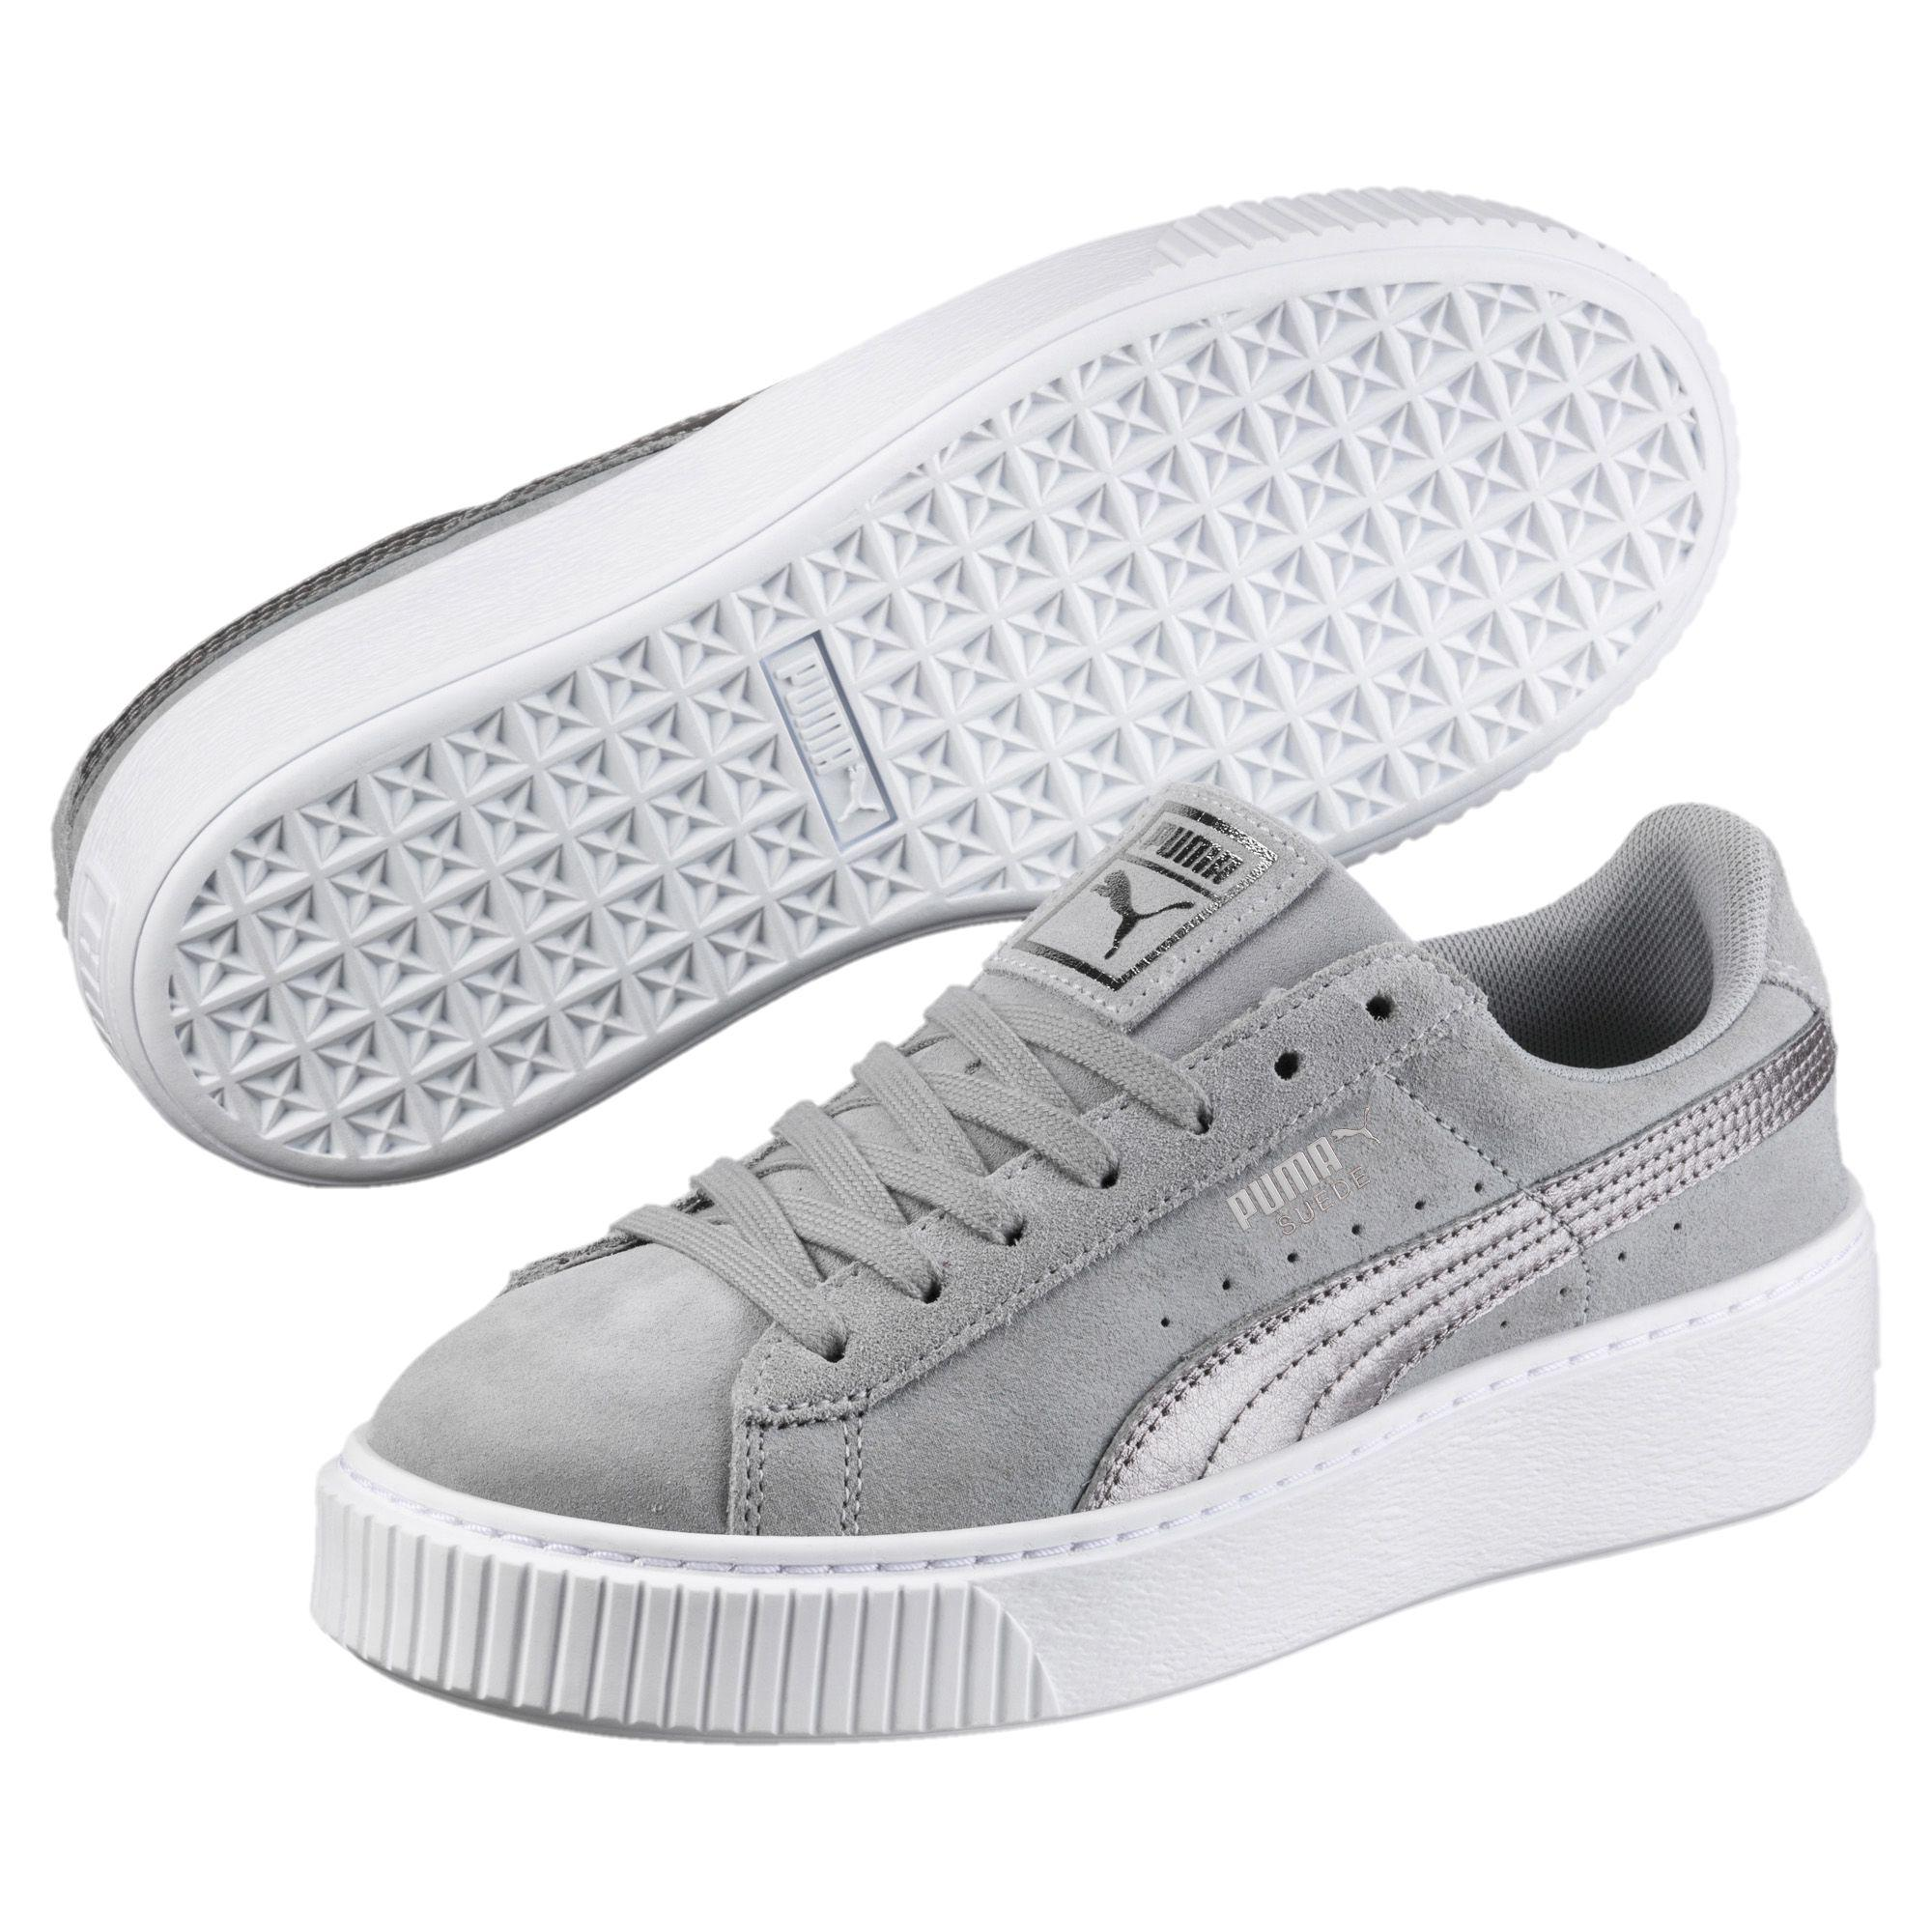 Lyst - PUMA Suede Platform Metallic Safari Women s Sneakers in Gray aa77e407e